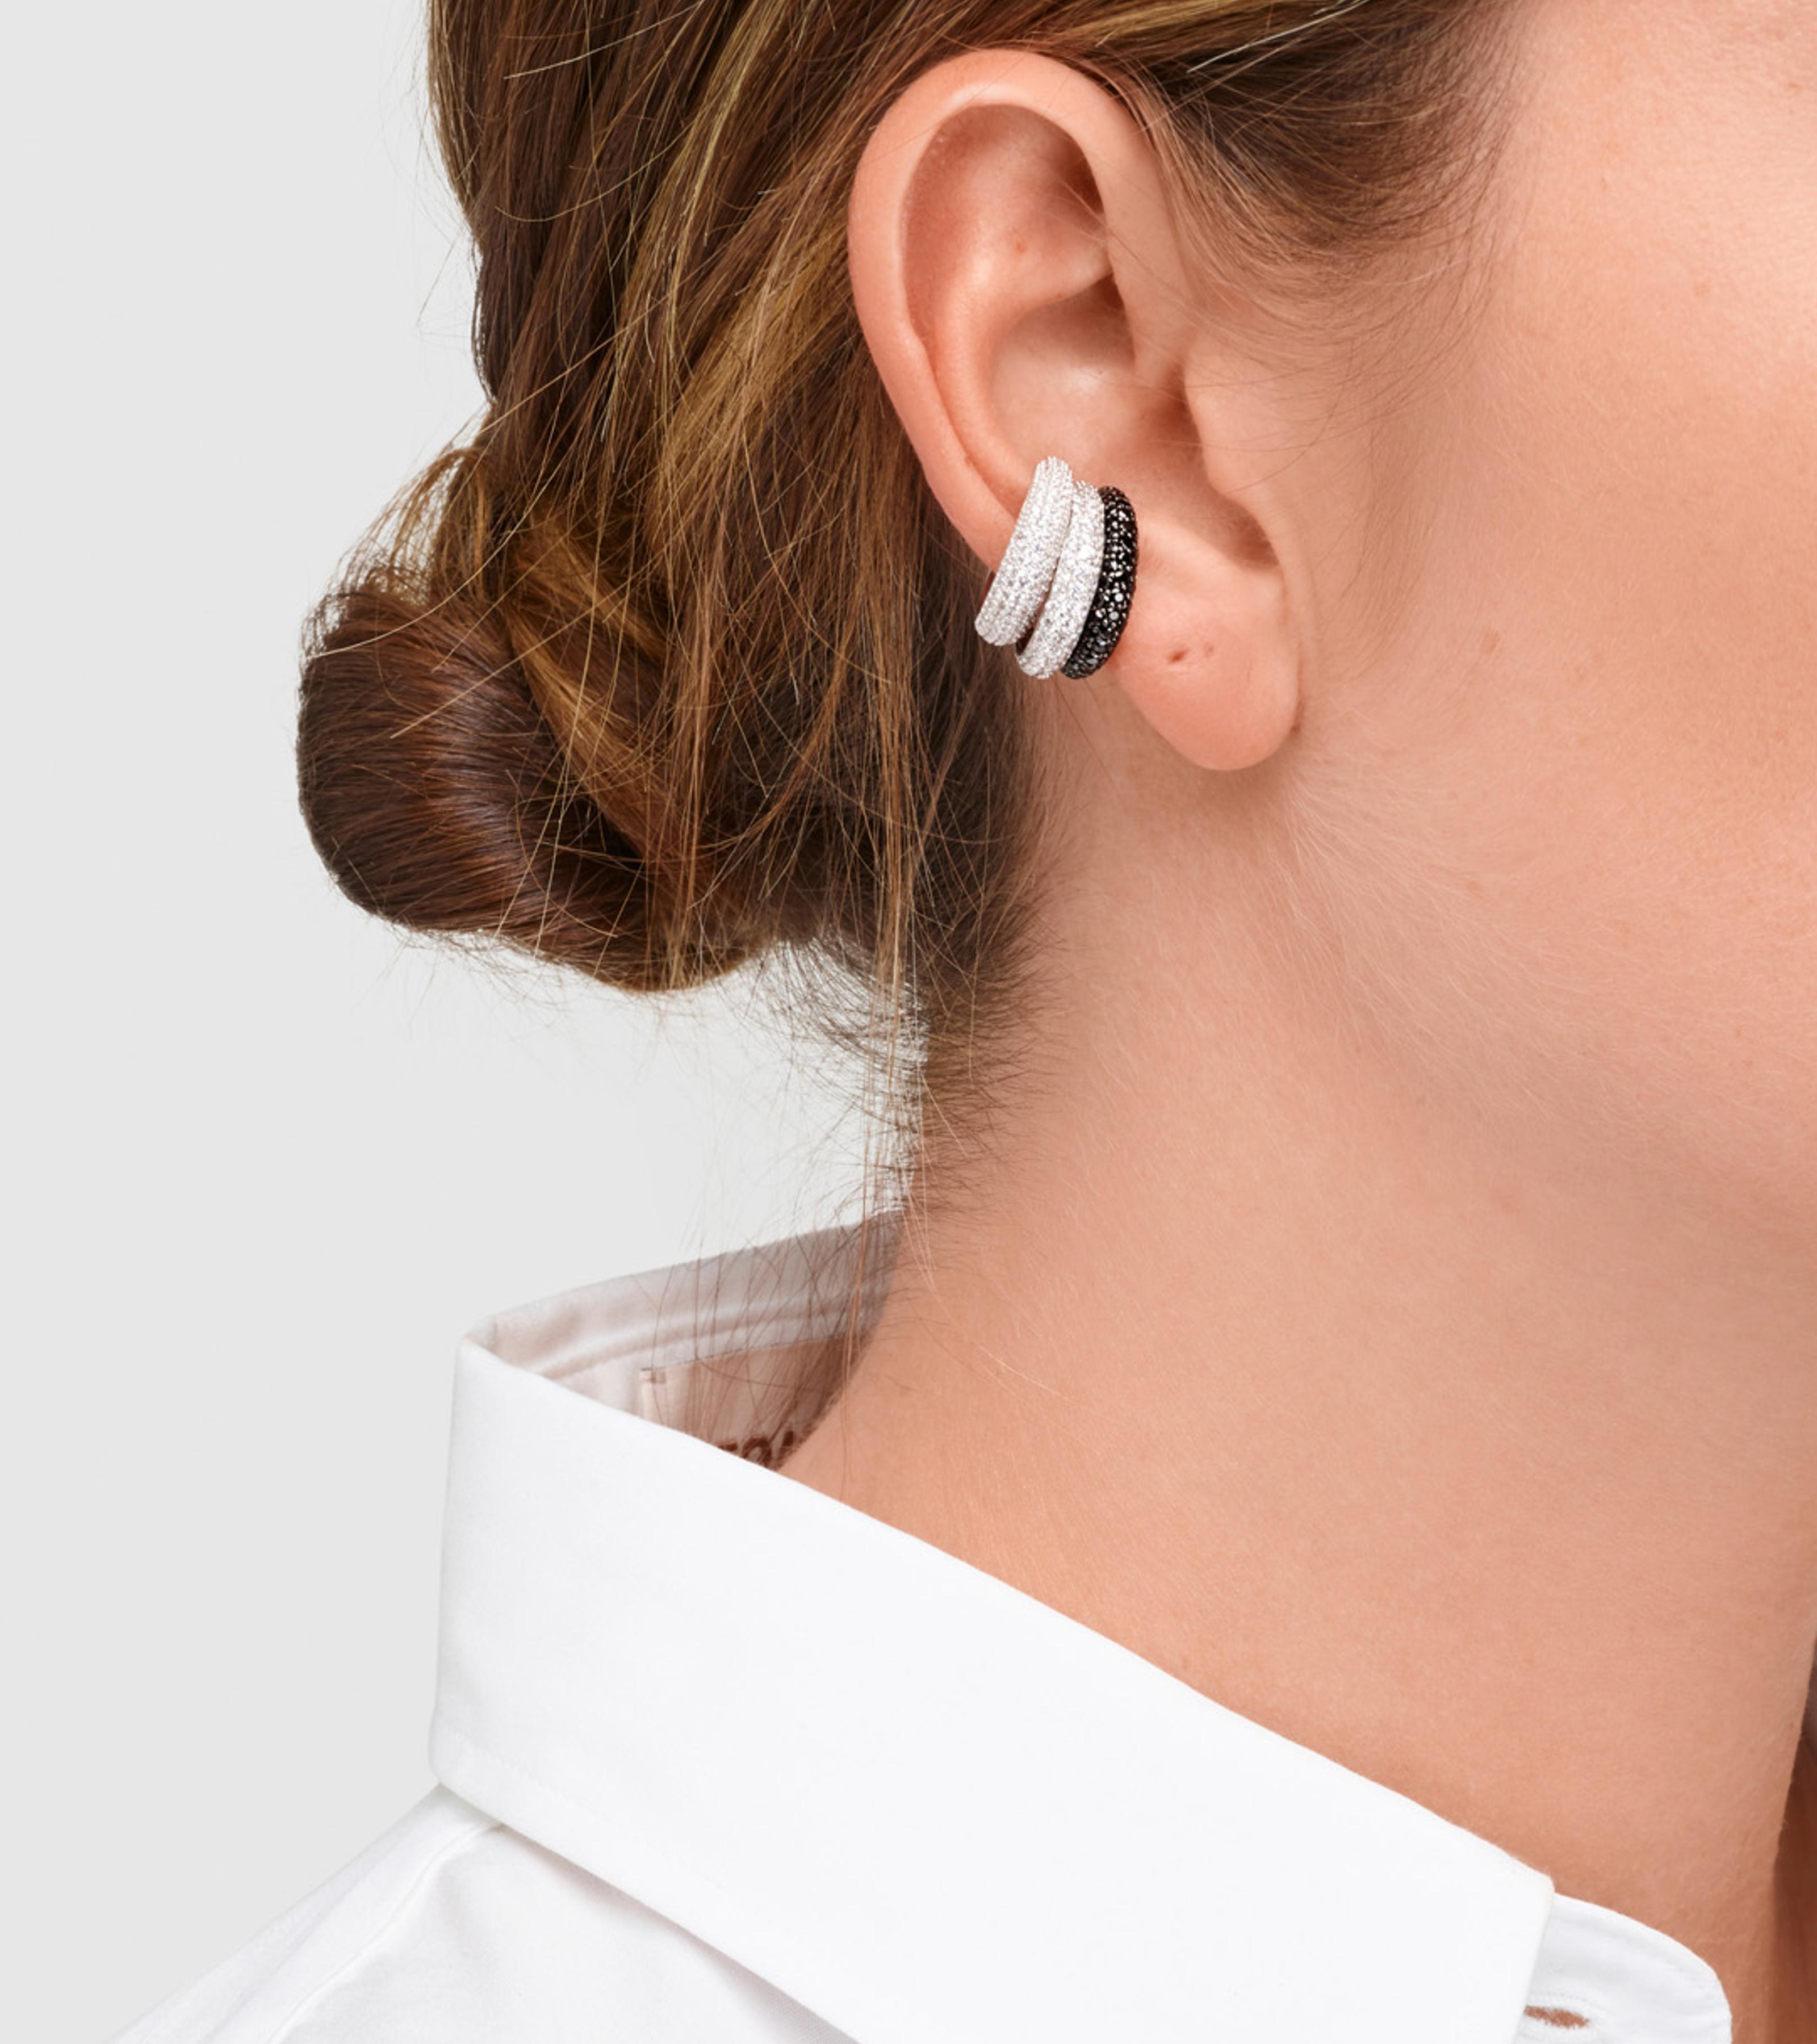 Ear Cuff Thick Zirconia